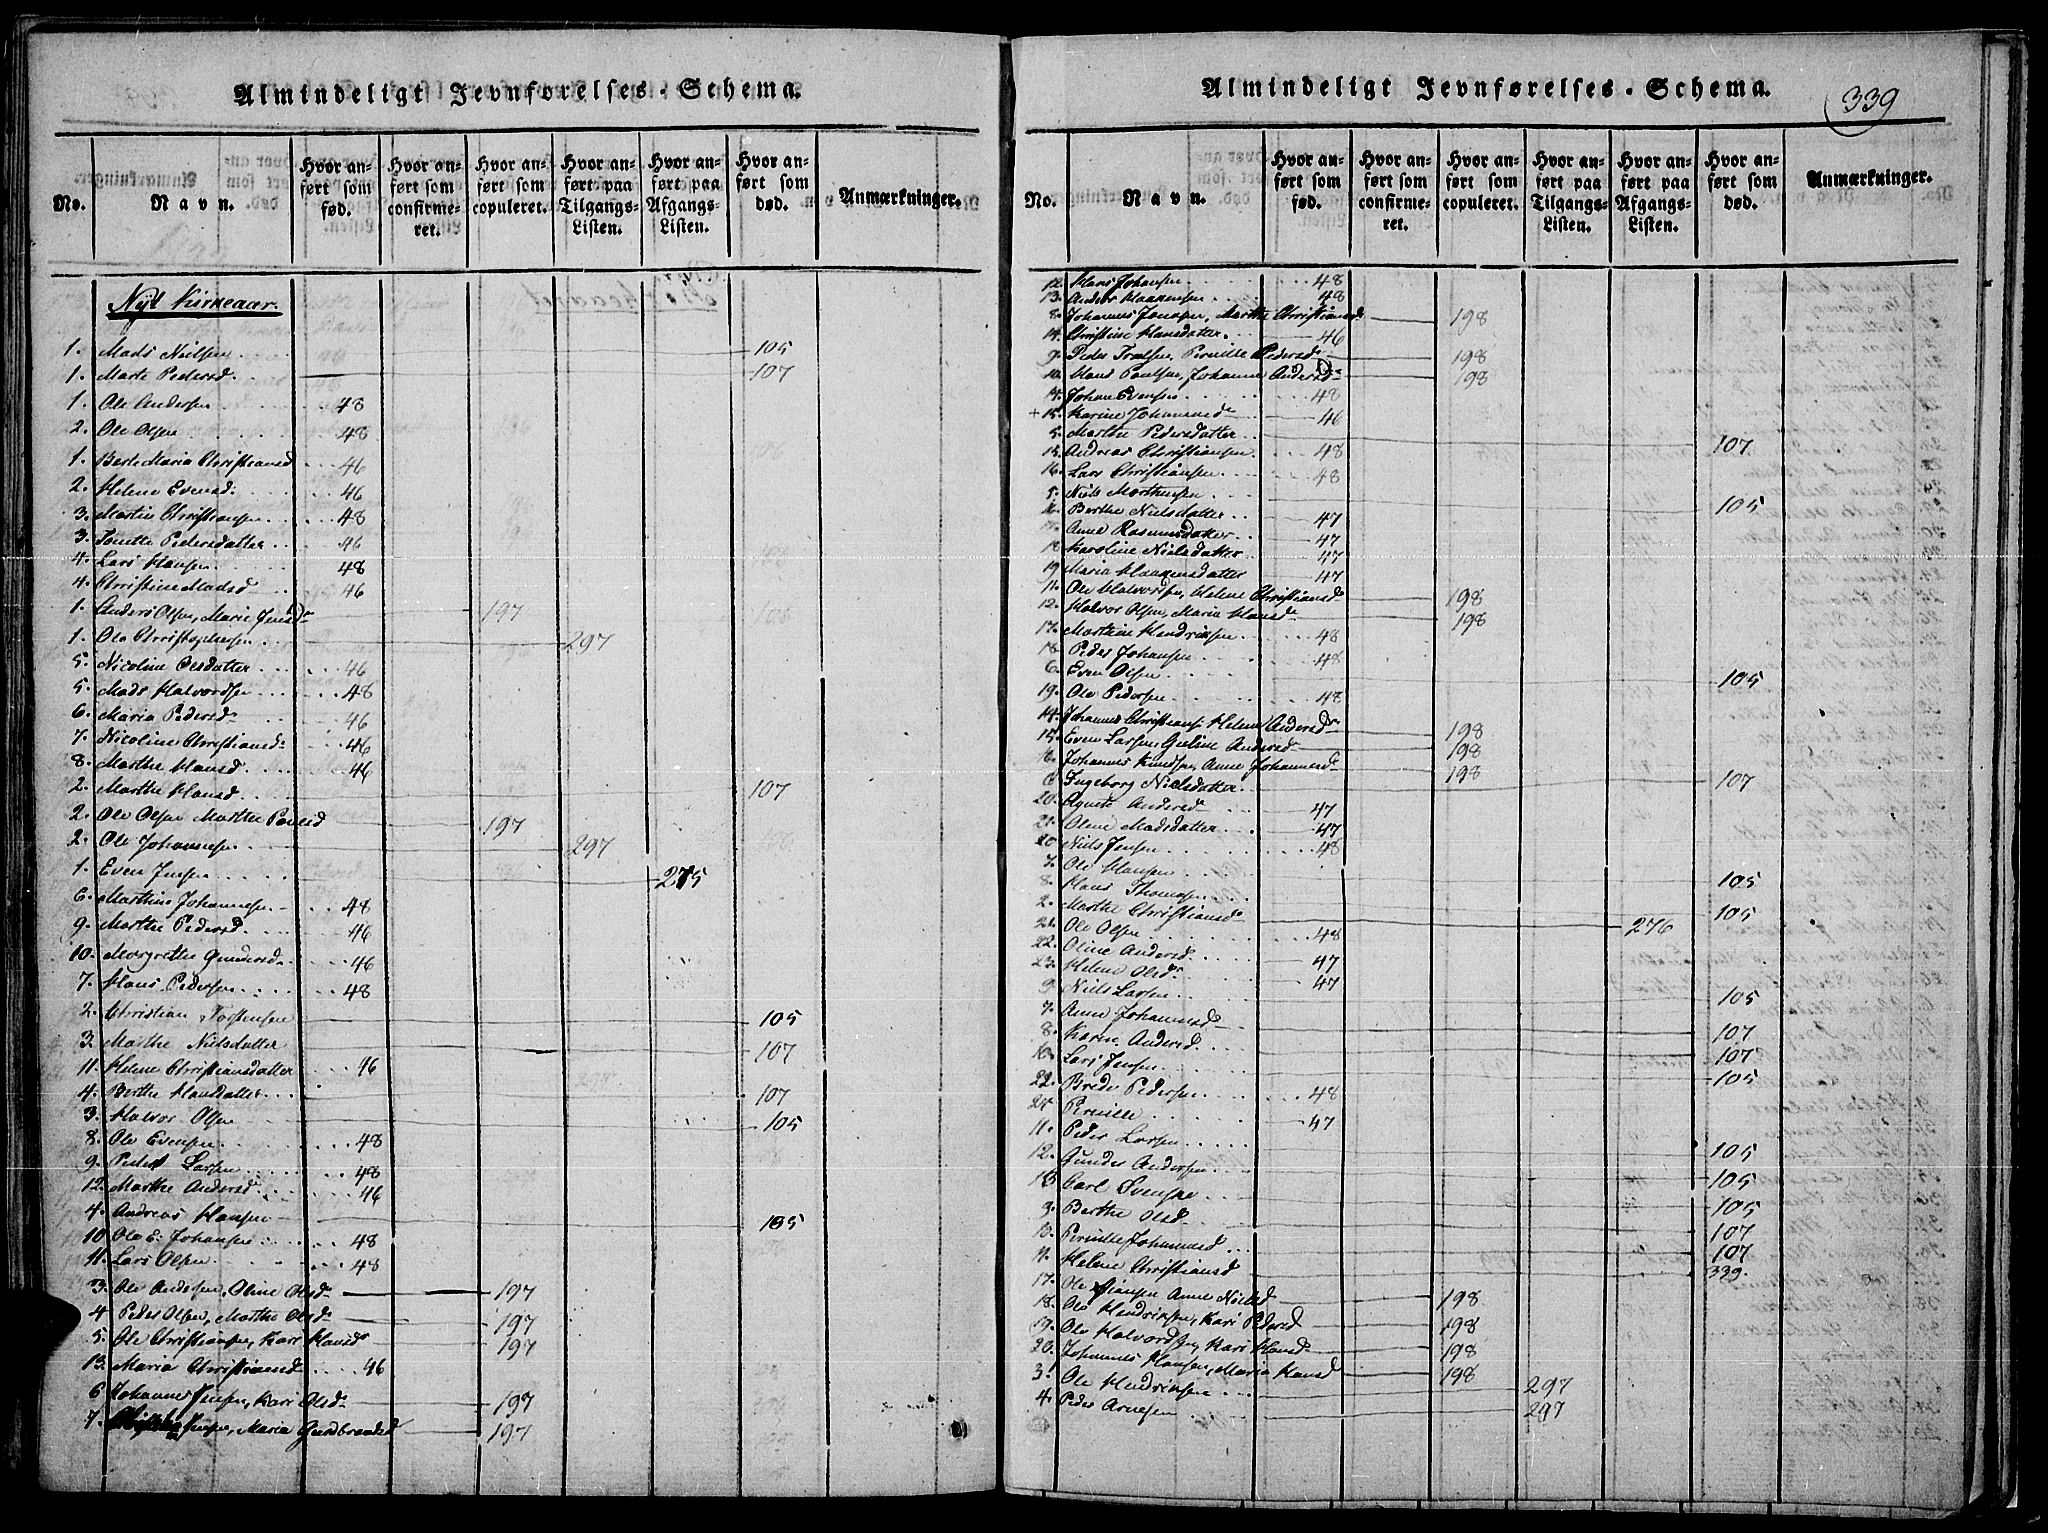 SAH, Toten prestekontor, Ministerialbok nr. 10, 1820-1828, s. 339